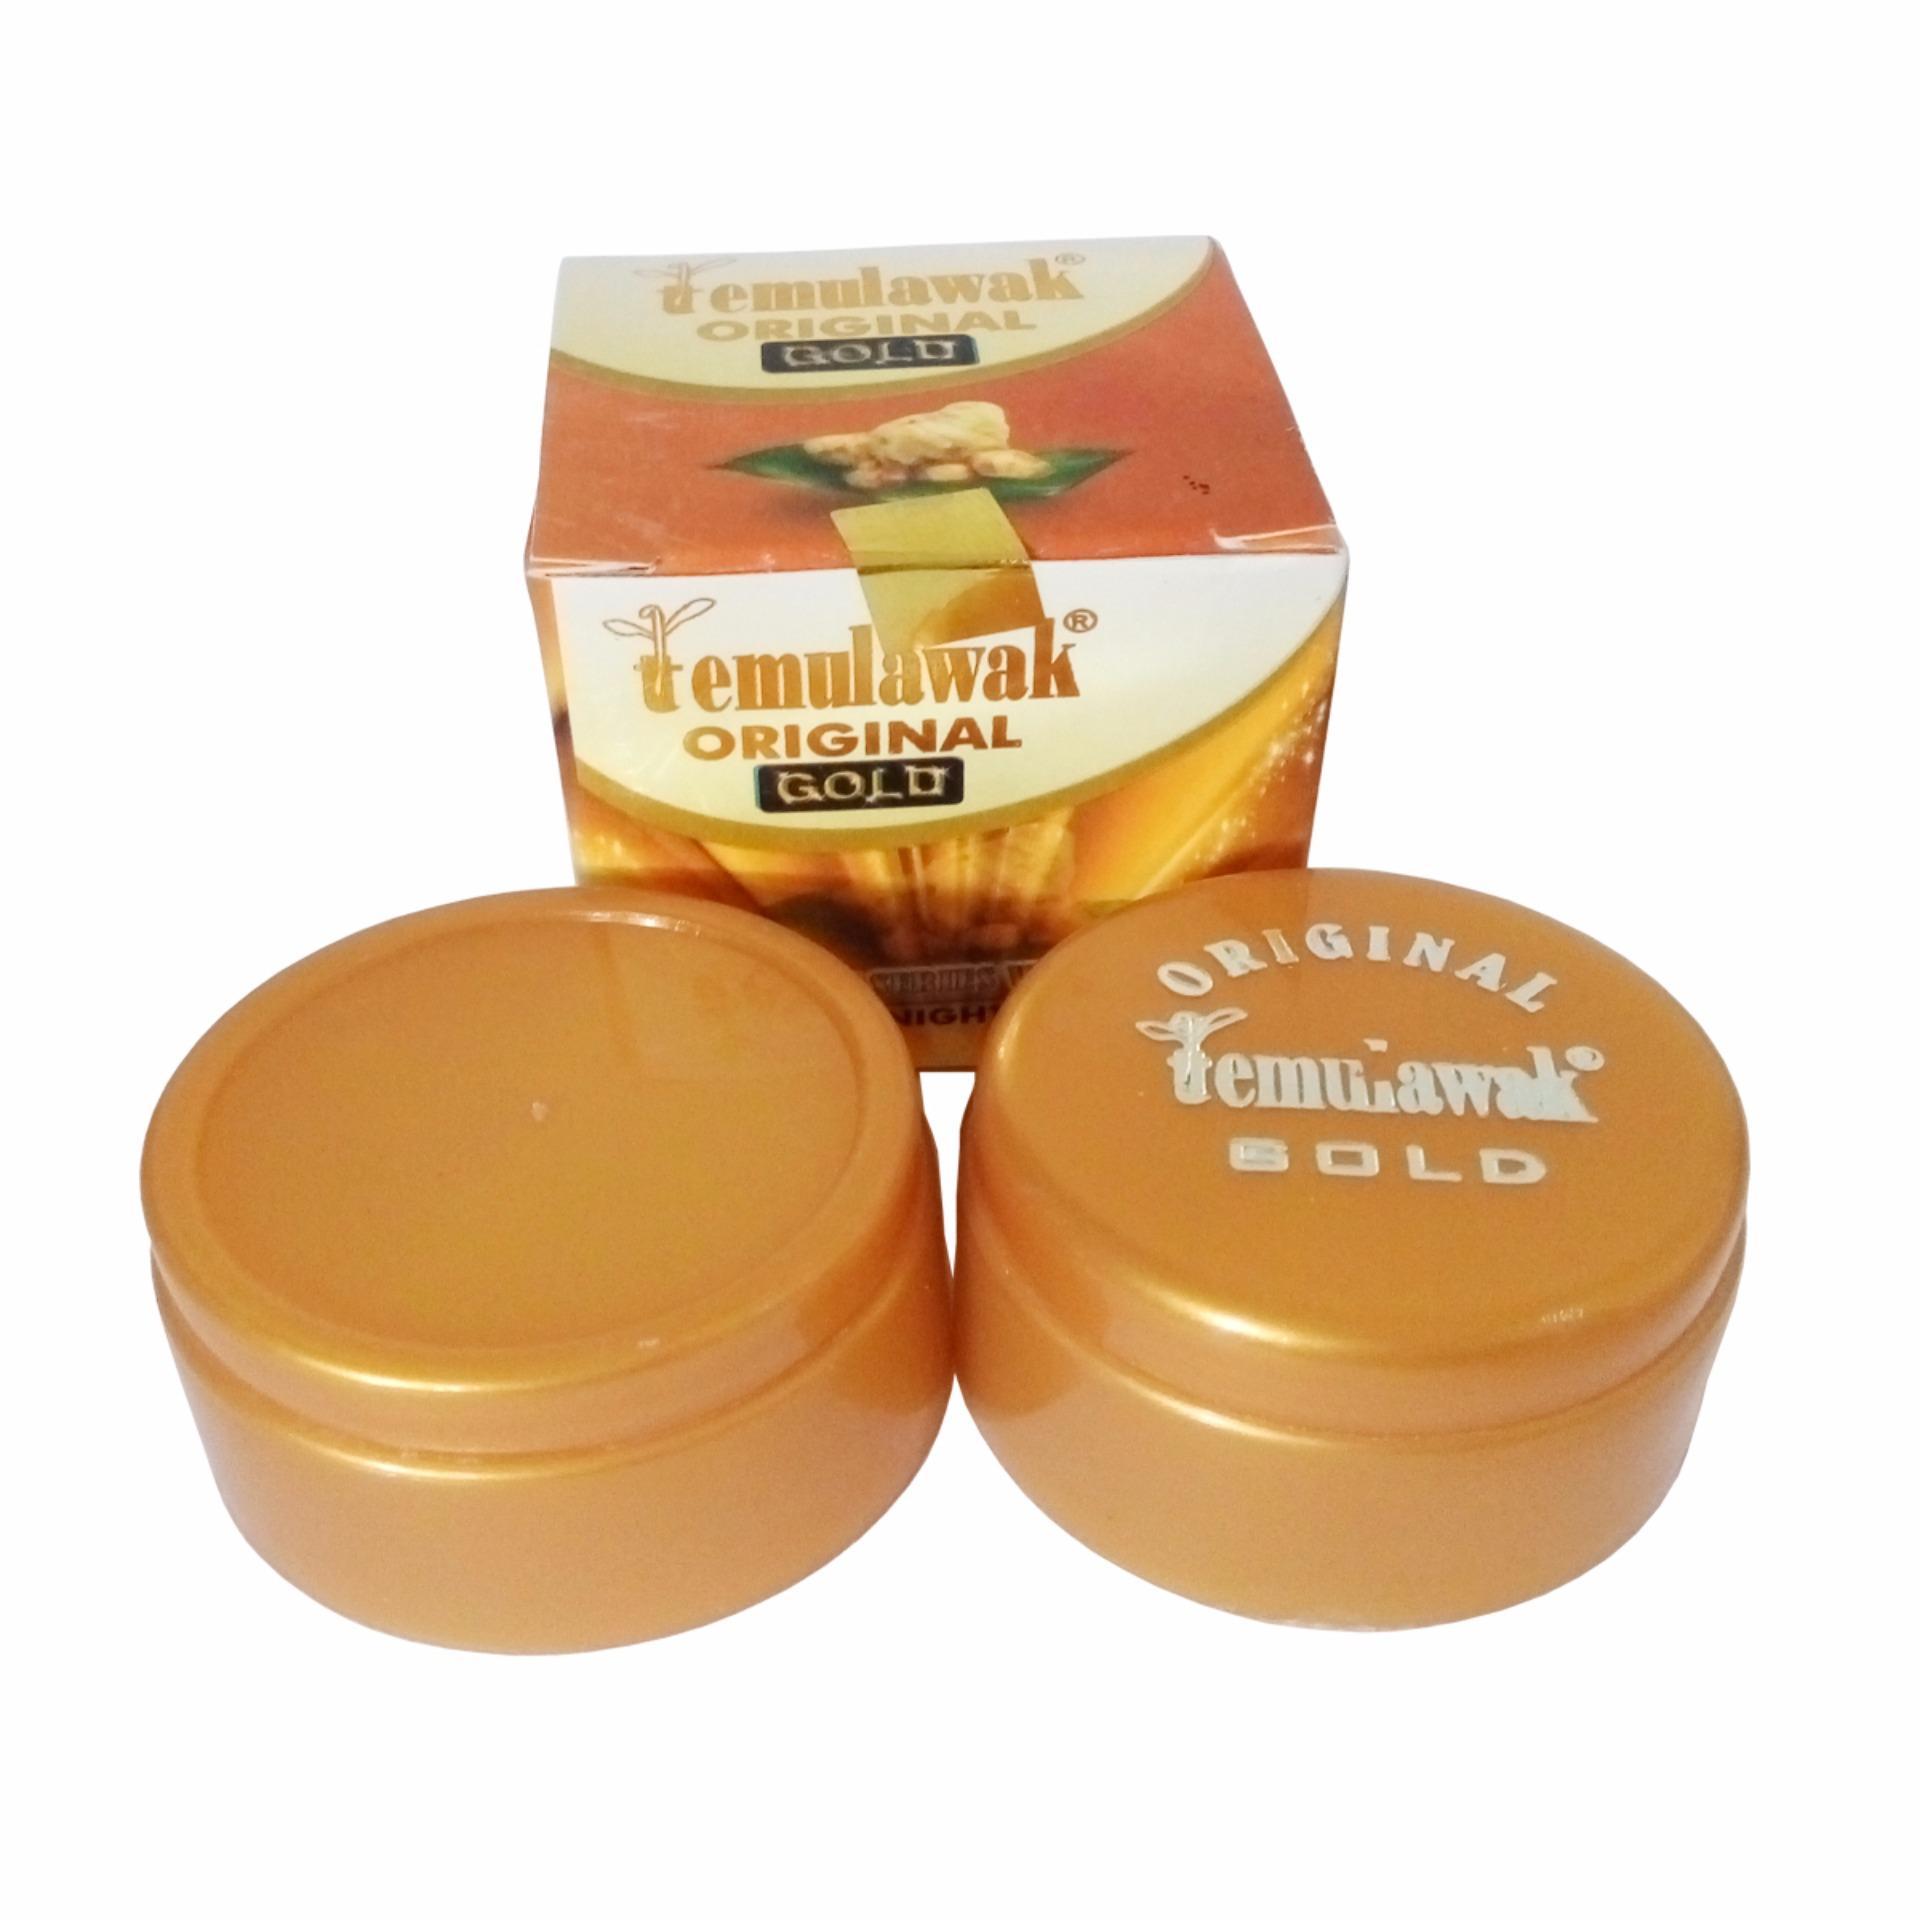 Eshop Checker Temulawak Cream Gold Susun Bedak Original Siang Malam